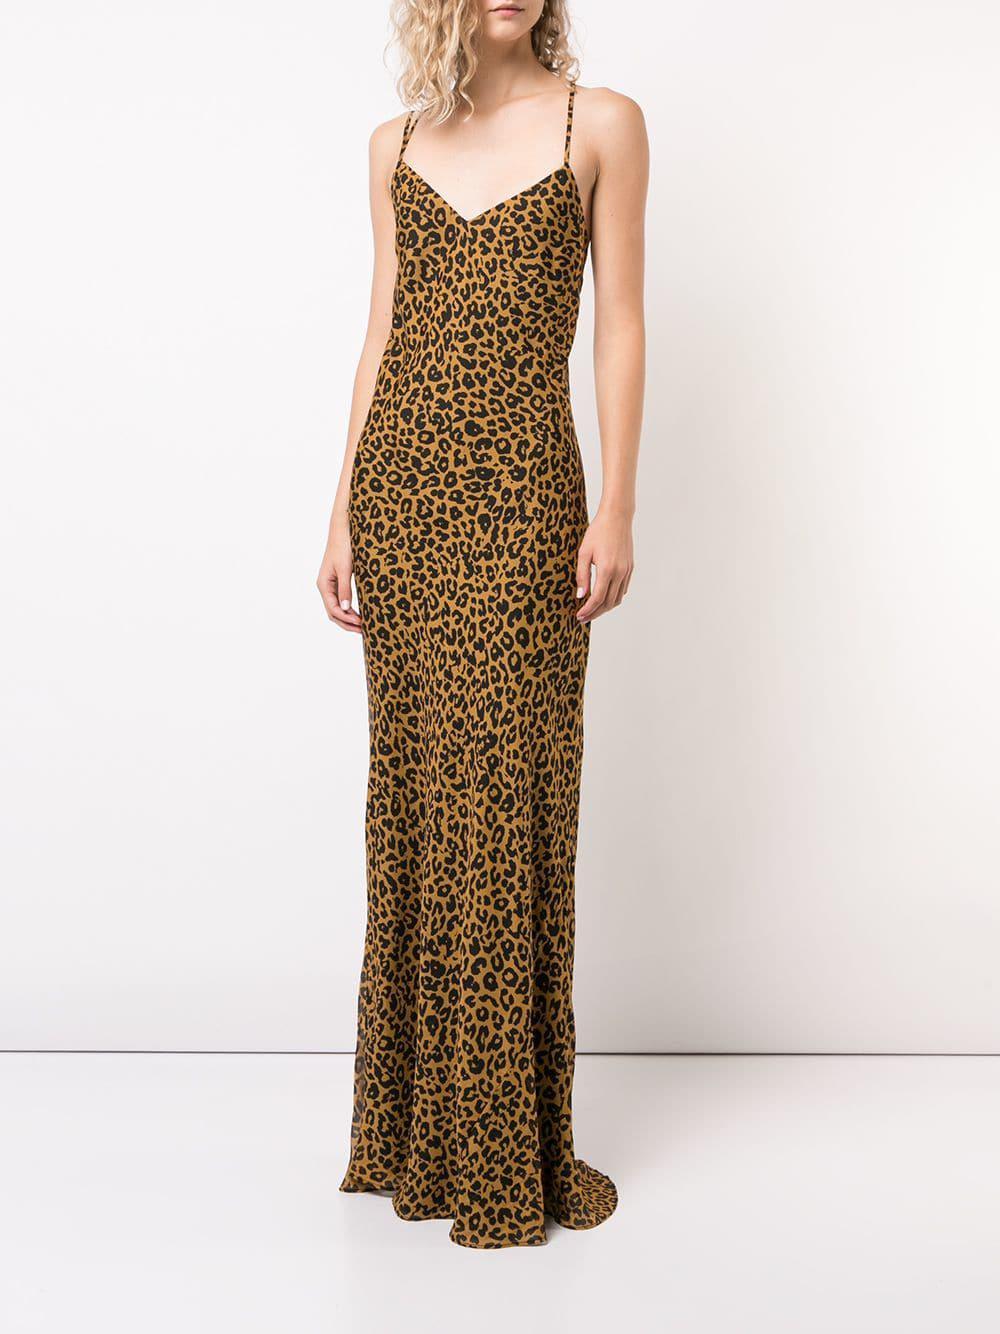 76e4c53e4 Lyst - Michelle Mason Leopard Print Bias Gown in Brown